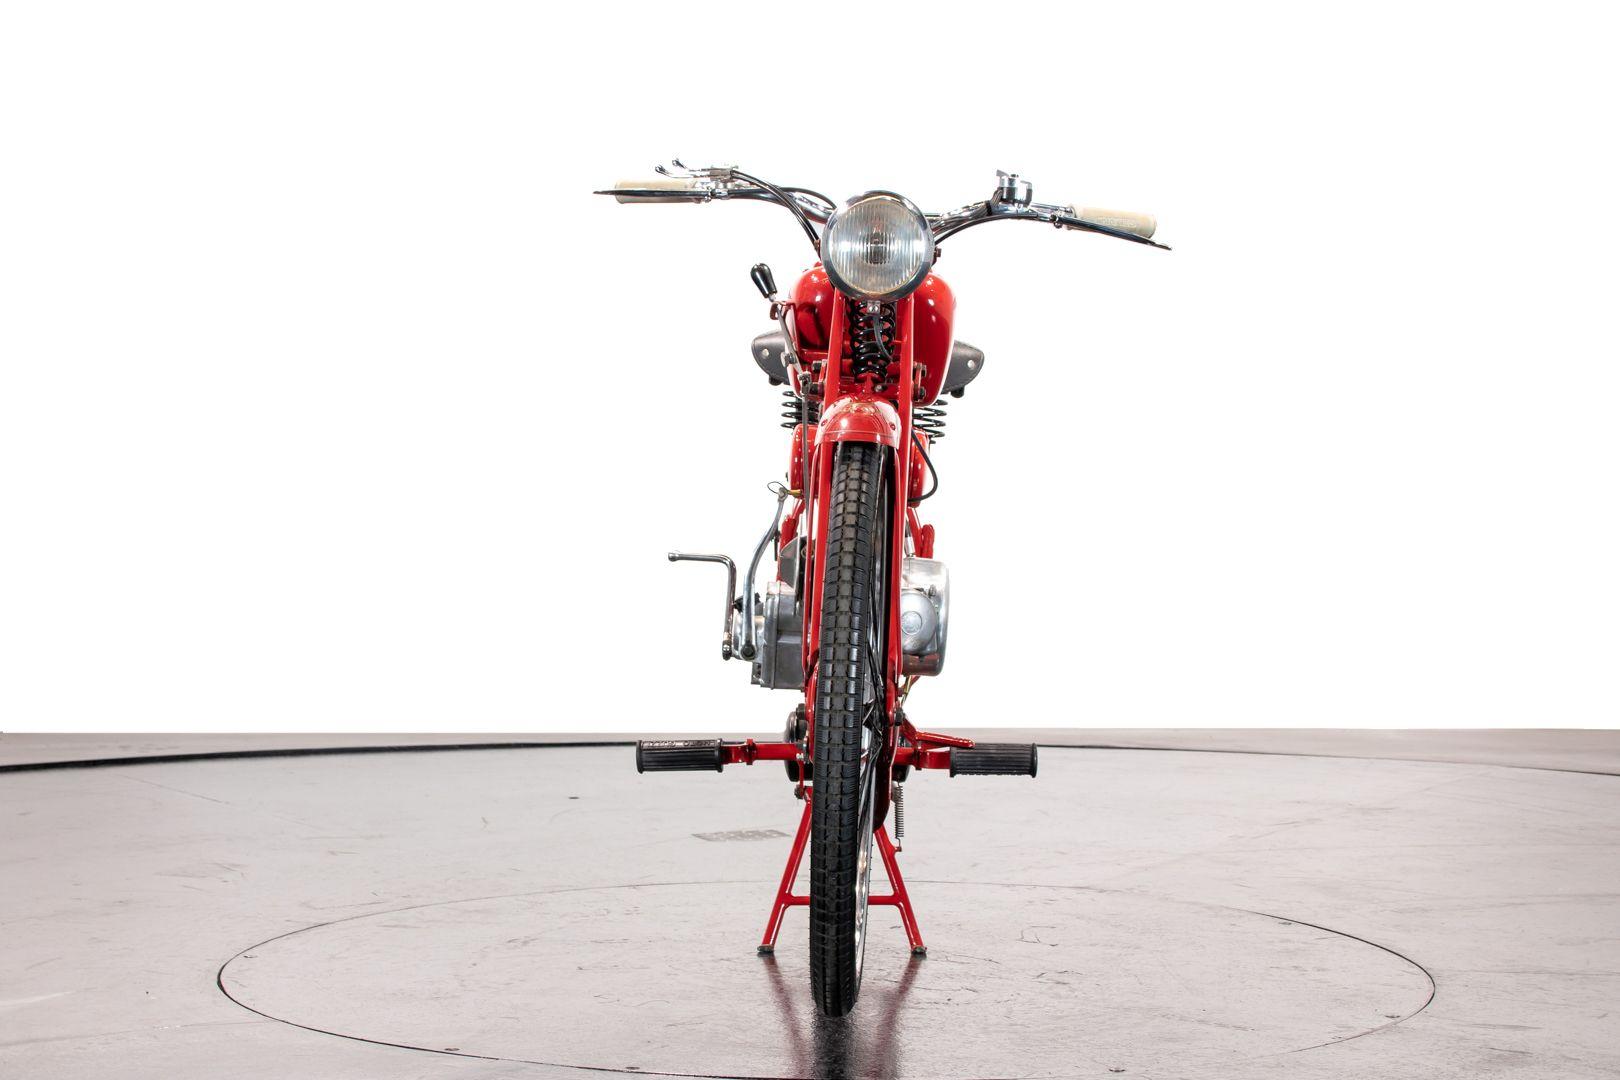 1952 Moto Guzzi 65 59386